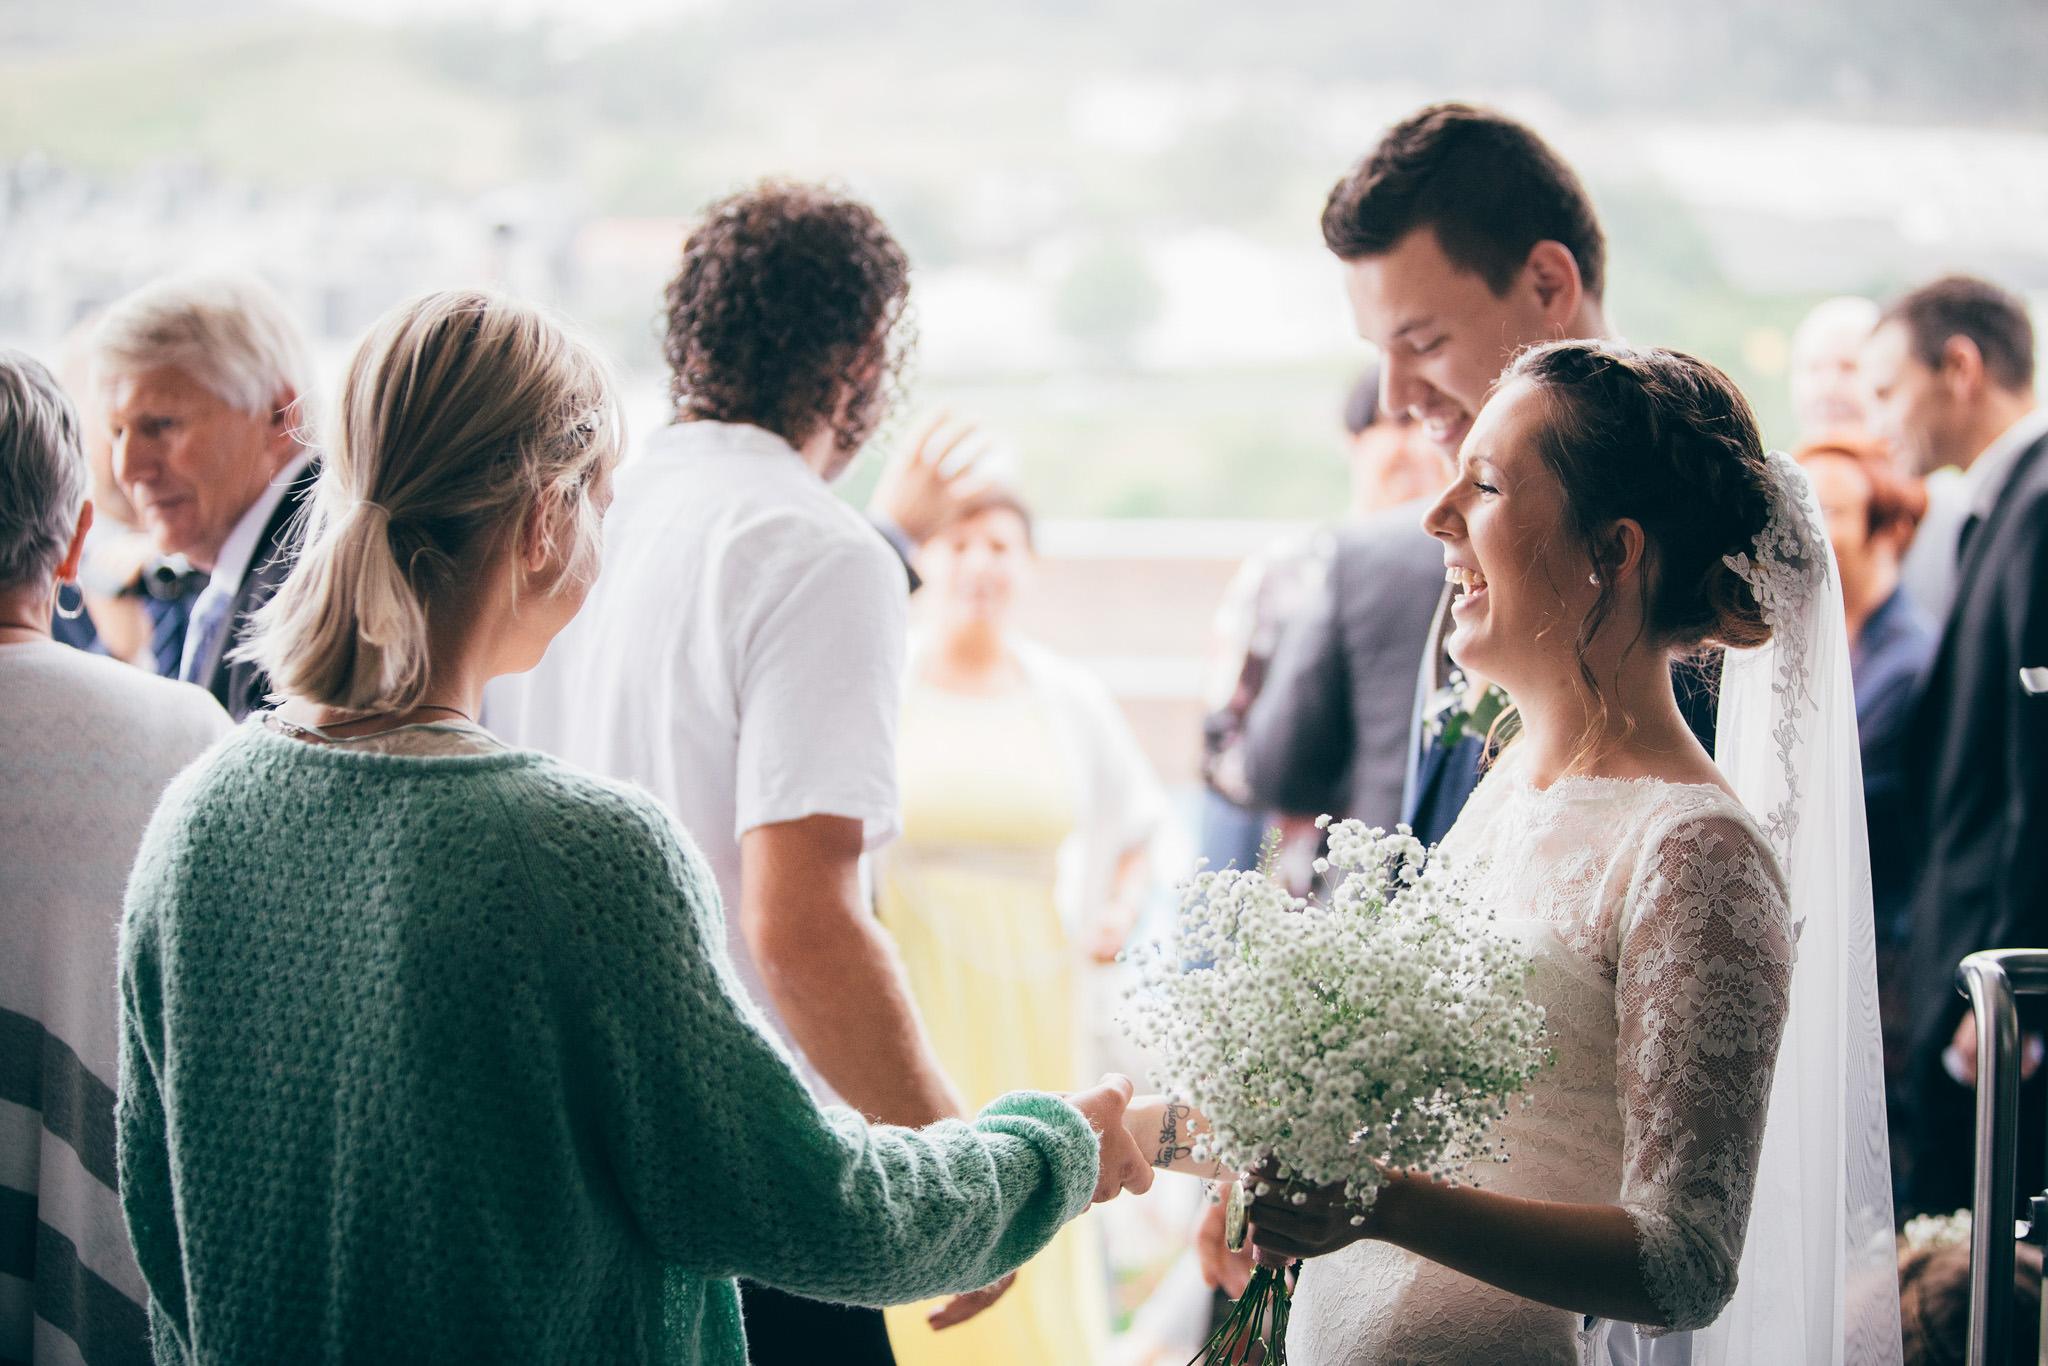 Norway+wedding+photographer+elopement+pre+wedding+Casey+Arneson-48.jpg